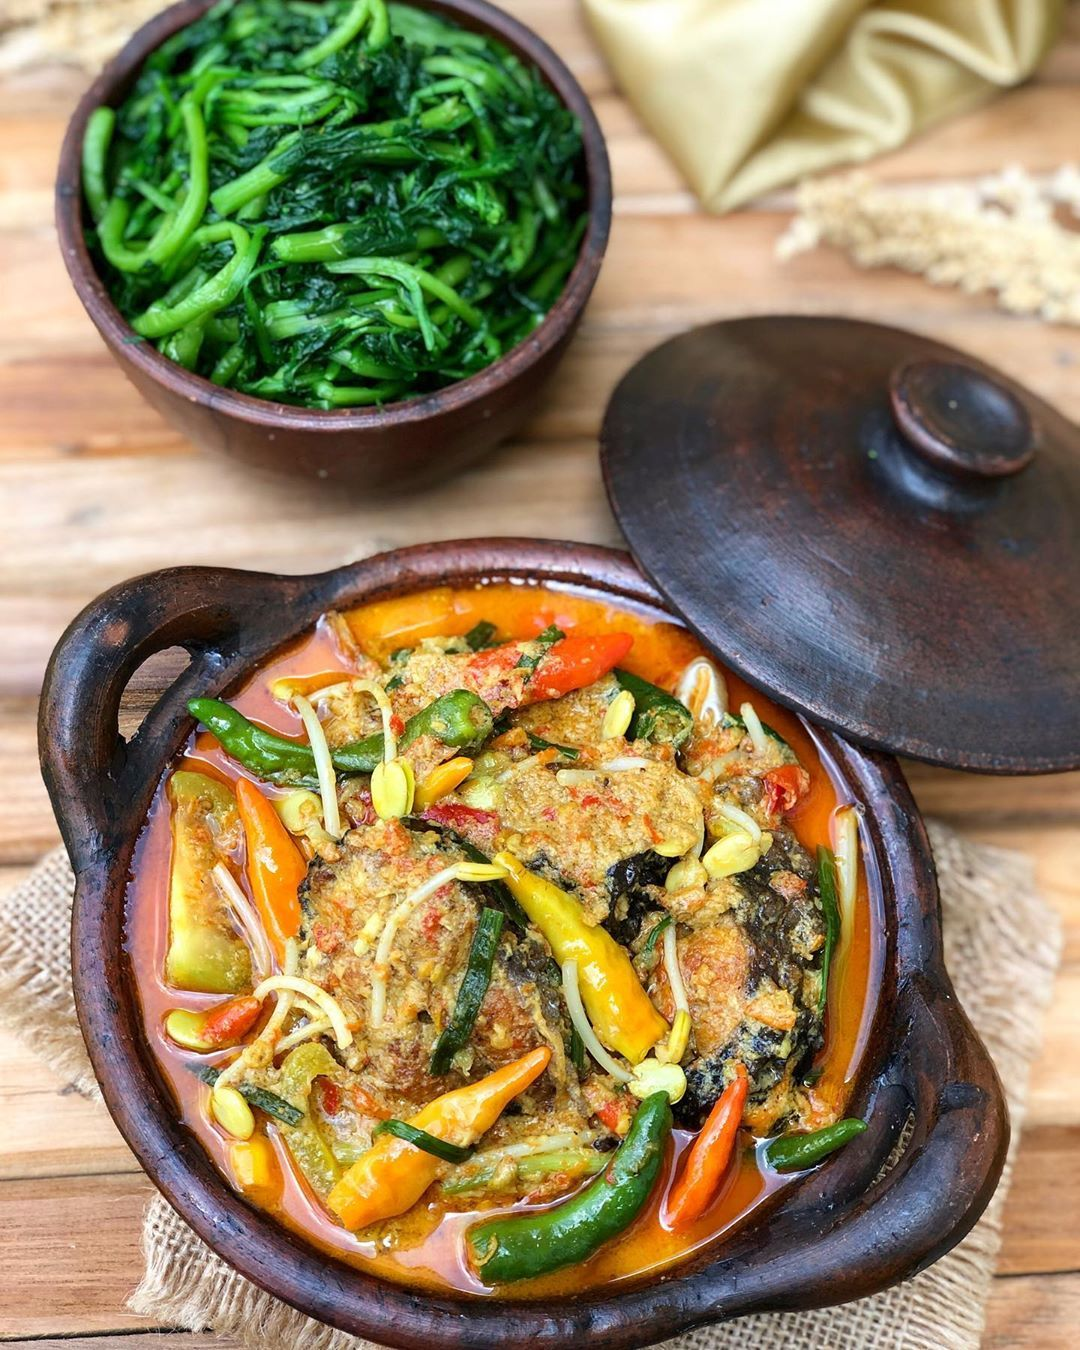 Resep Kothok Ikan Patin Dan Cara Membuat Kotok Ikan Patin Lengkap Bumbu Masakan Kotokan Ikan Patin Dan Langkah Bikin Ikan Masak San Resep Resep Masakan Masakan